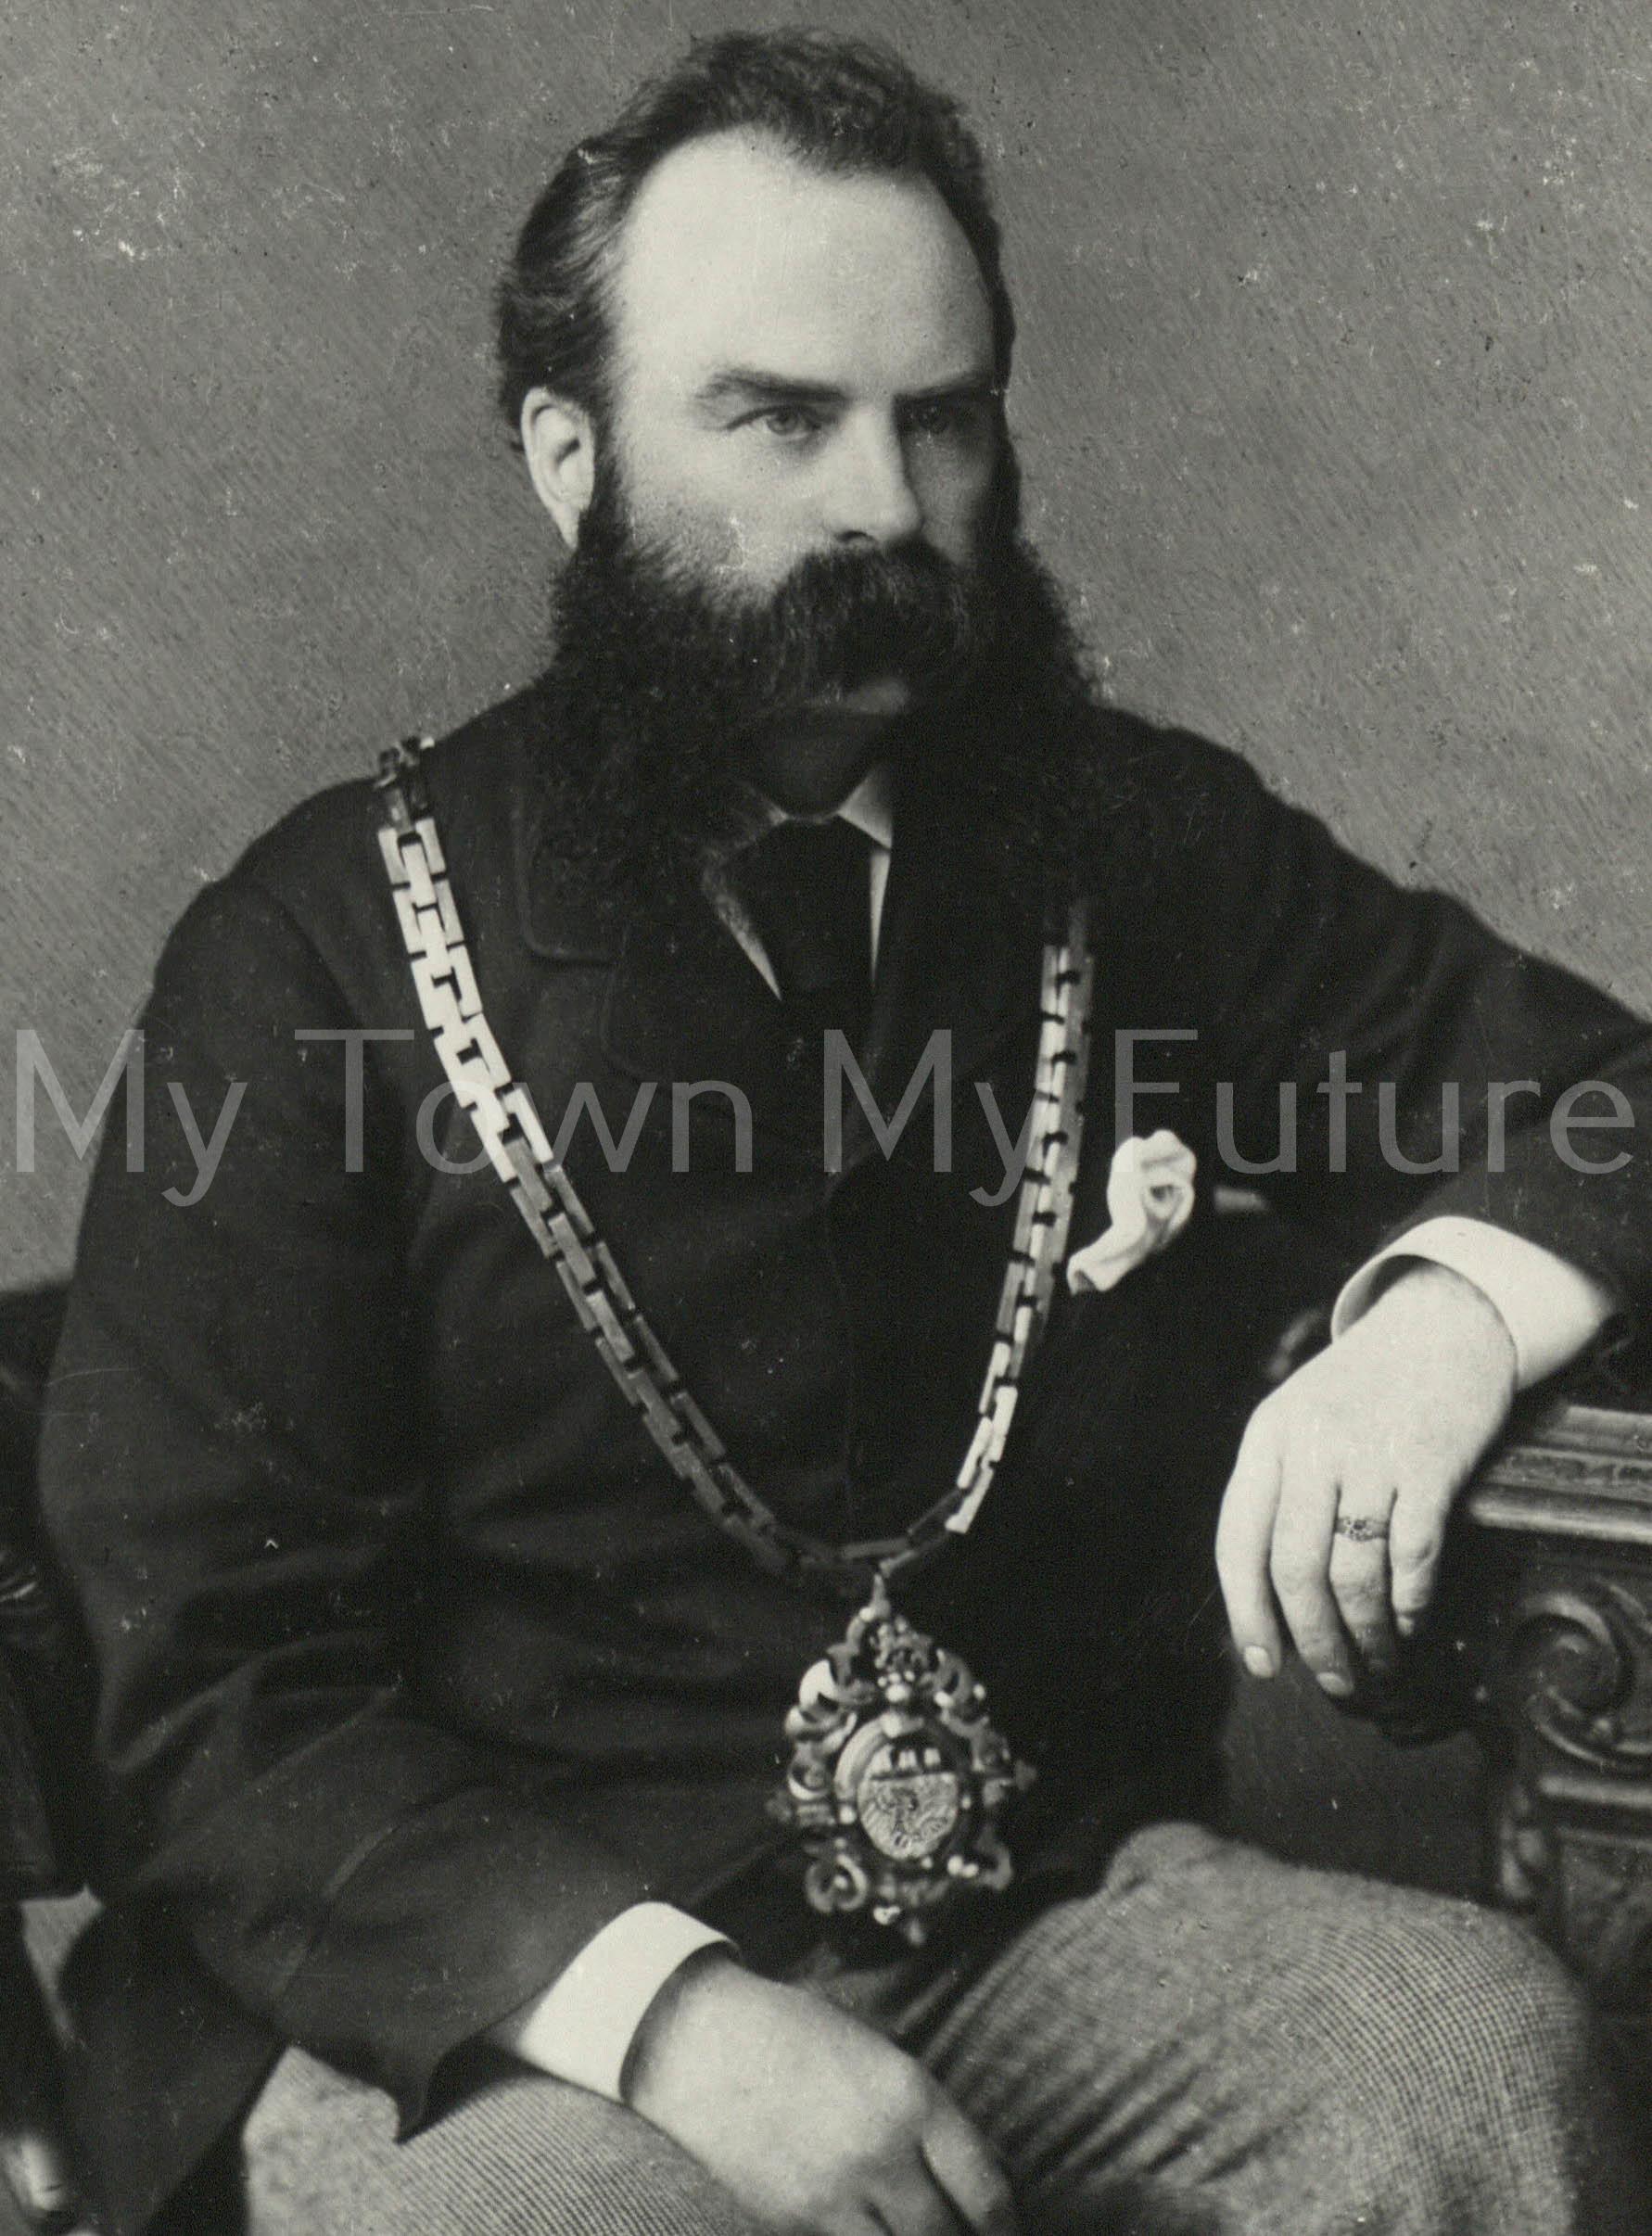 Alderman Robert Stephenson,Mayor Of Middlesbrough